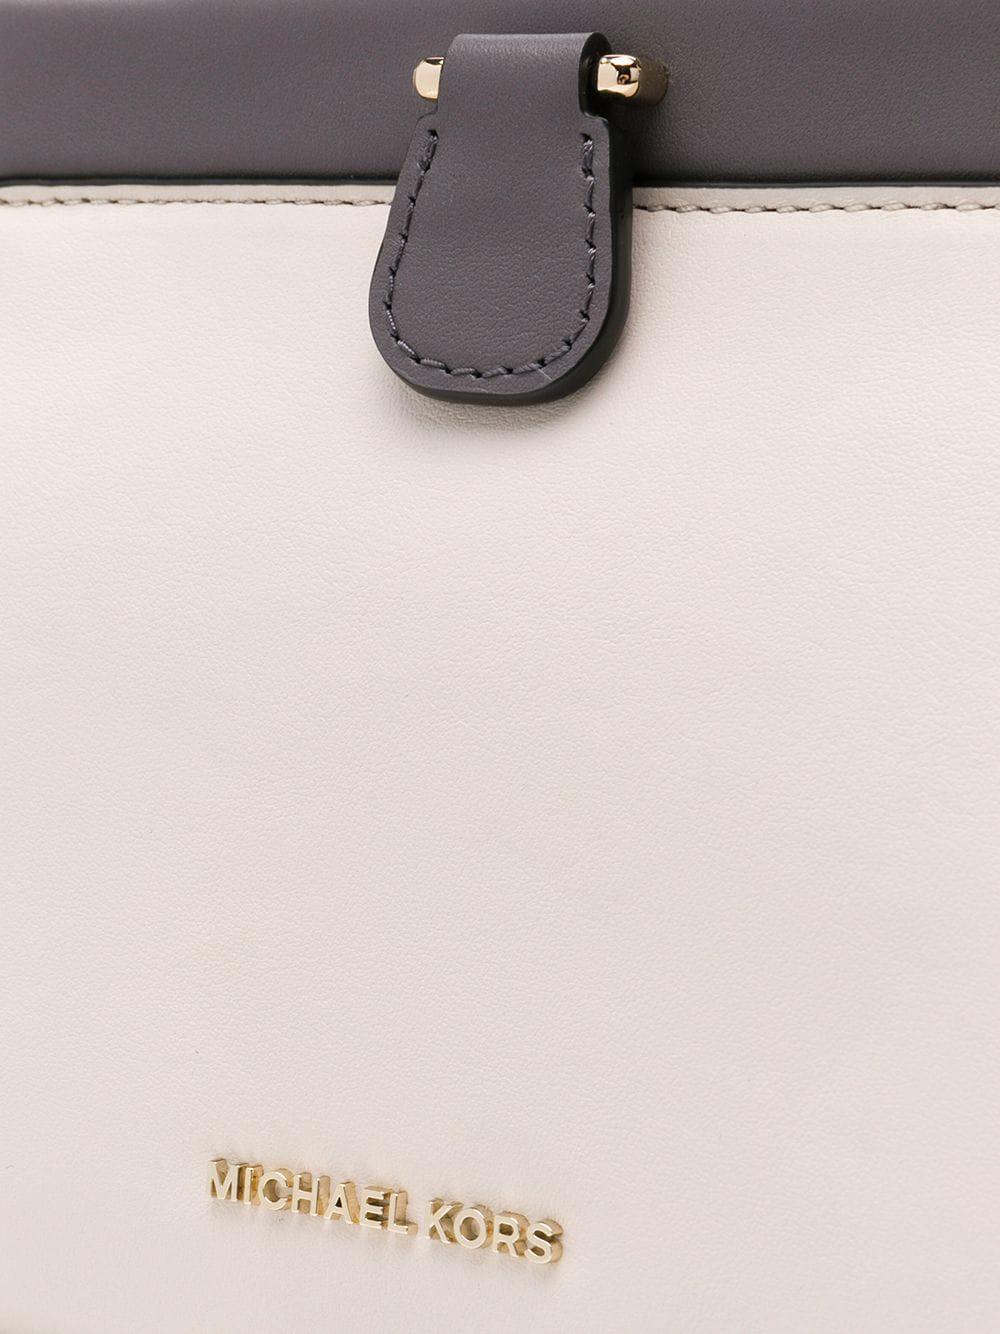 454a12cfe0 Michael Michael Kors 30f8tz6s1t083 278 Lt Crm Multi Leather fur exotic Skins - leather - Lyst